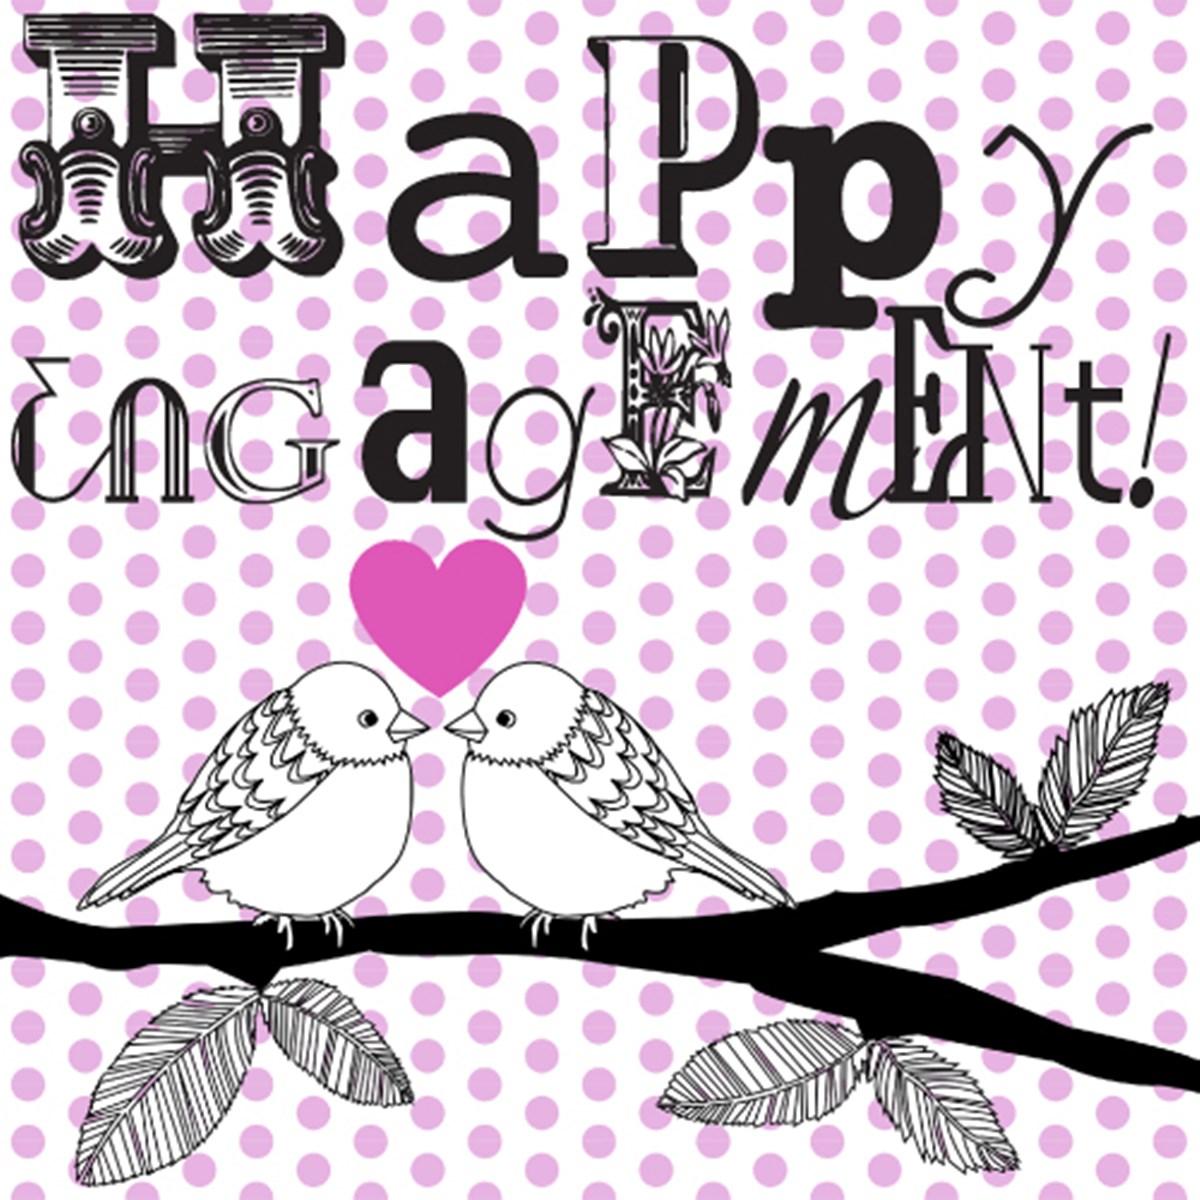 Happy Engagement - Chandoo Occupied :) - XciteFun.net